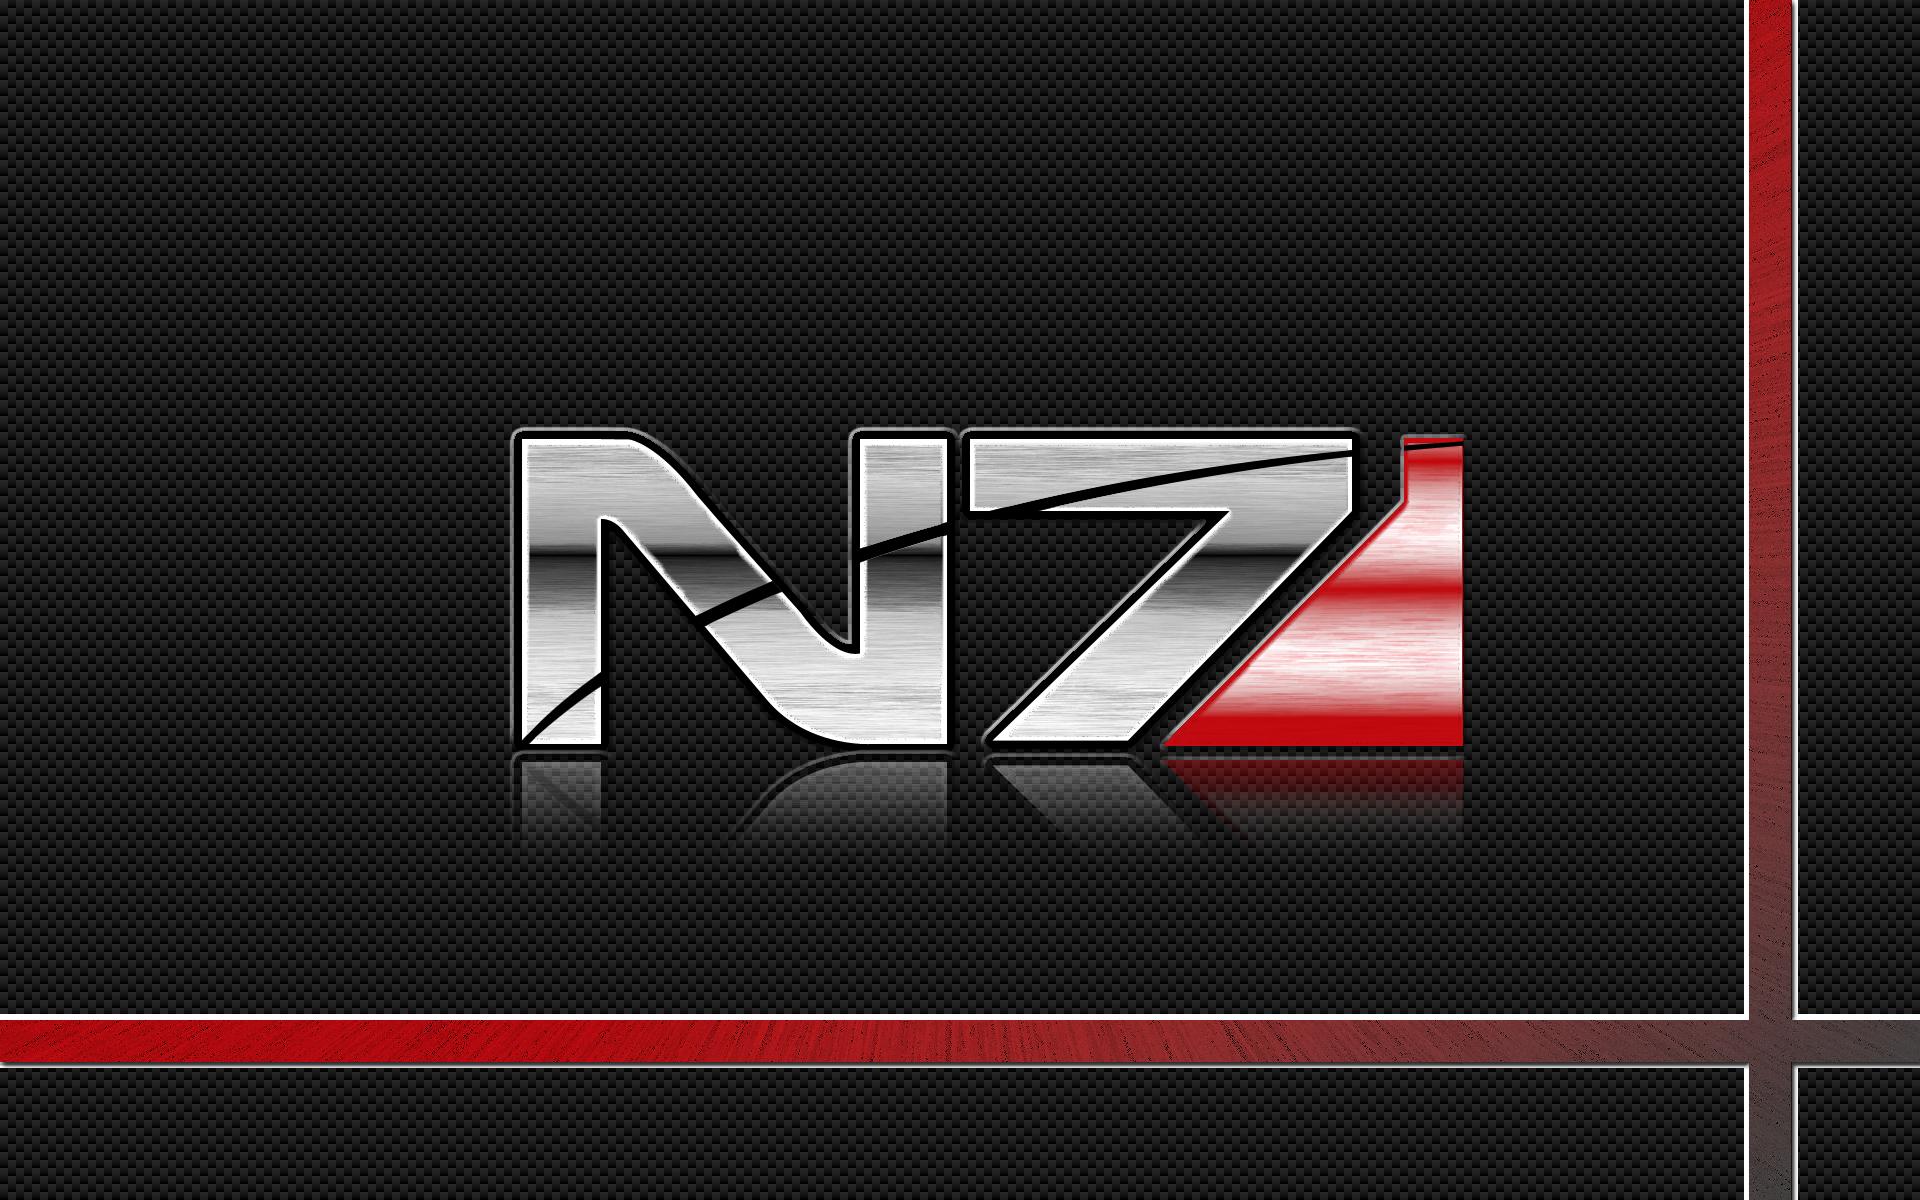 Mass Effect N7 Logo Wallpaper By Pyrogx2000 On Deviantart Mass Effect Mass Effect Art Mass